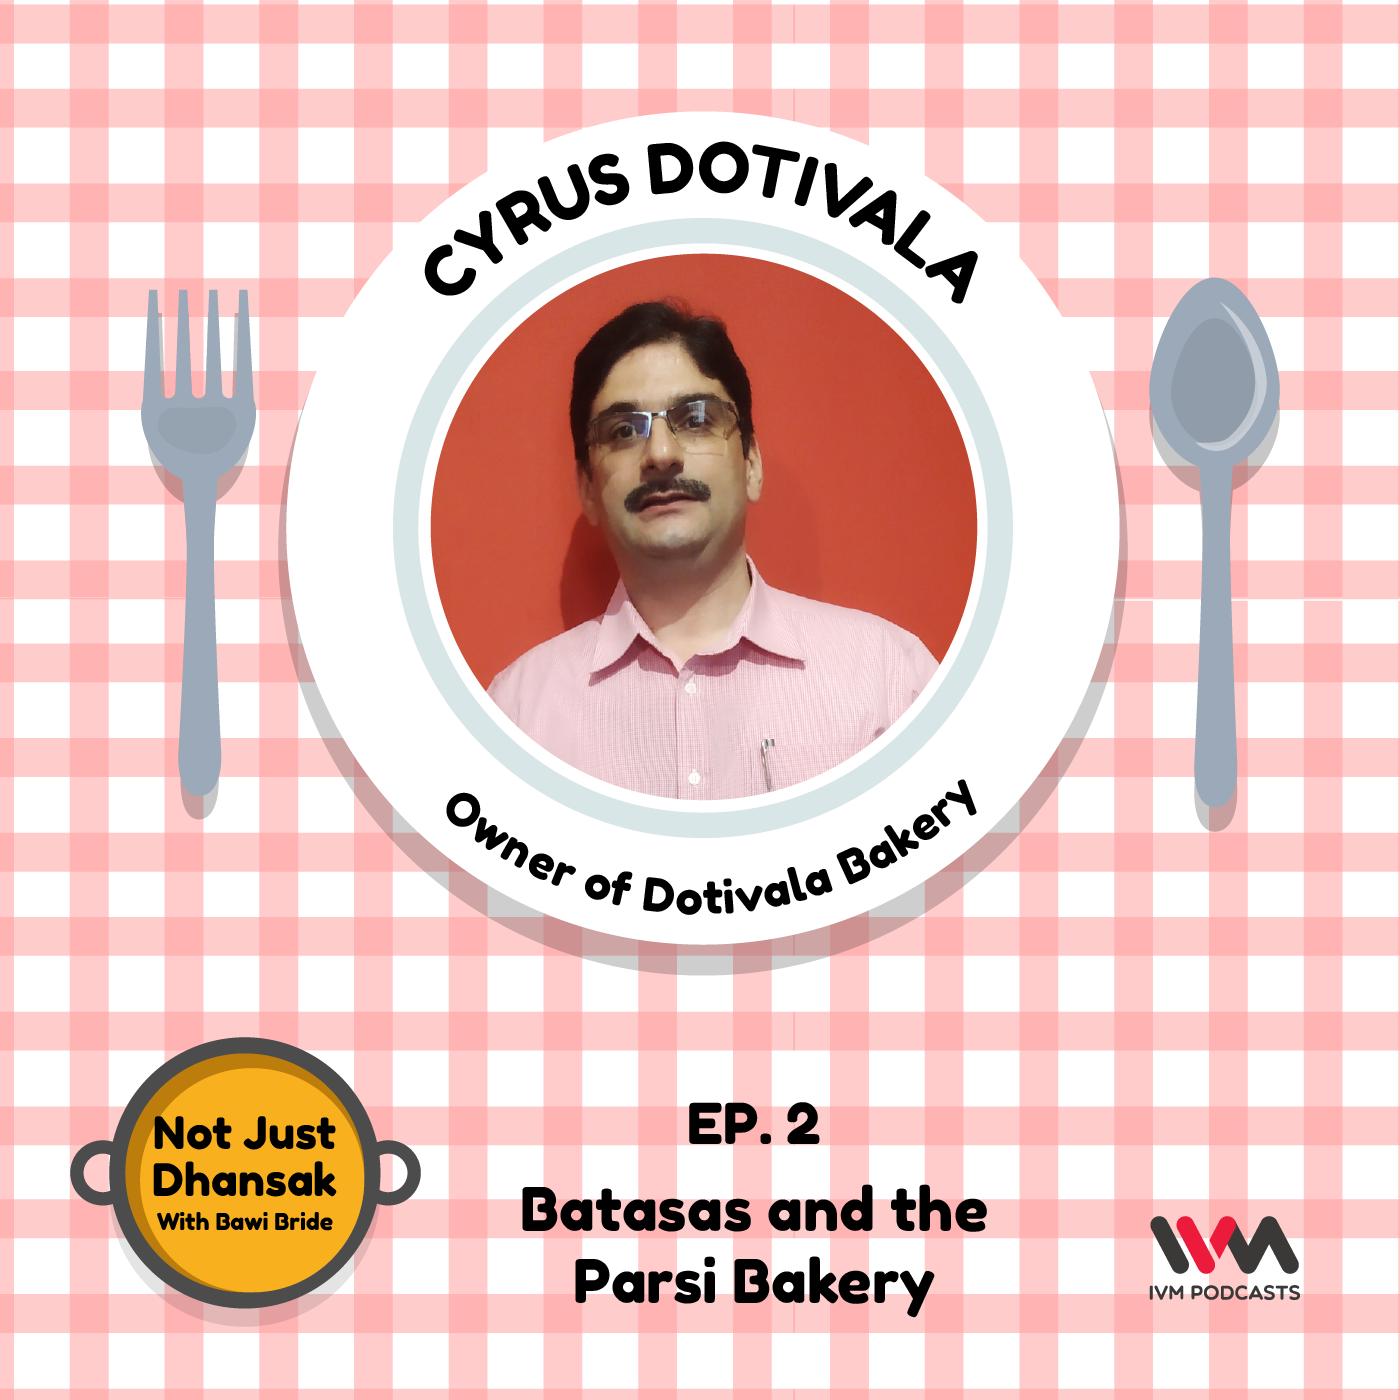 Ep. 02: Batasas and the Parsi Bakery